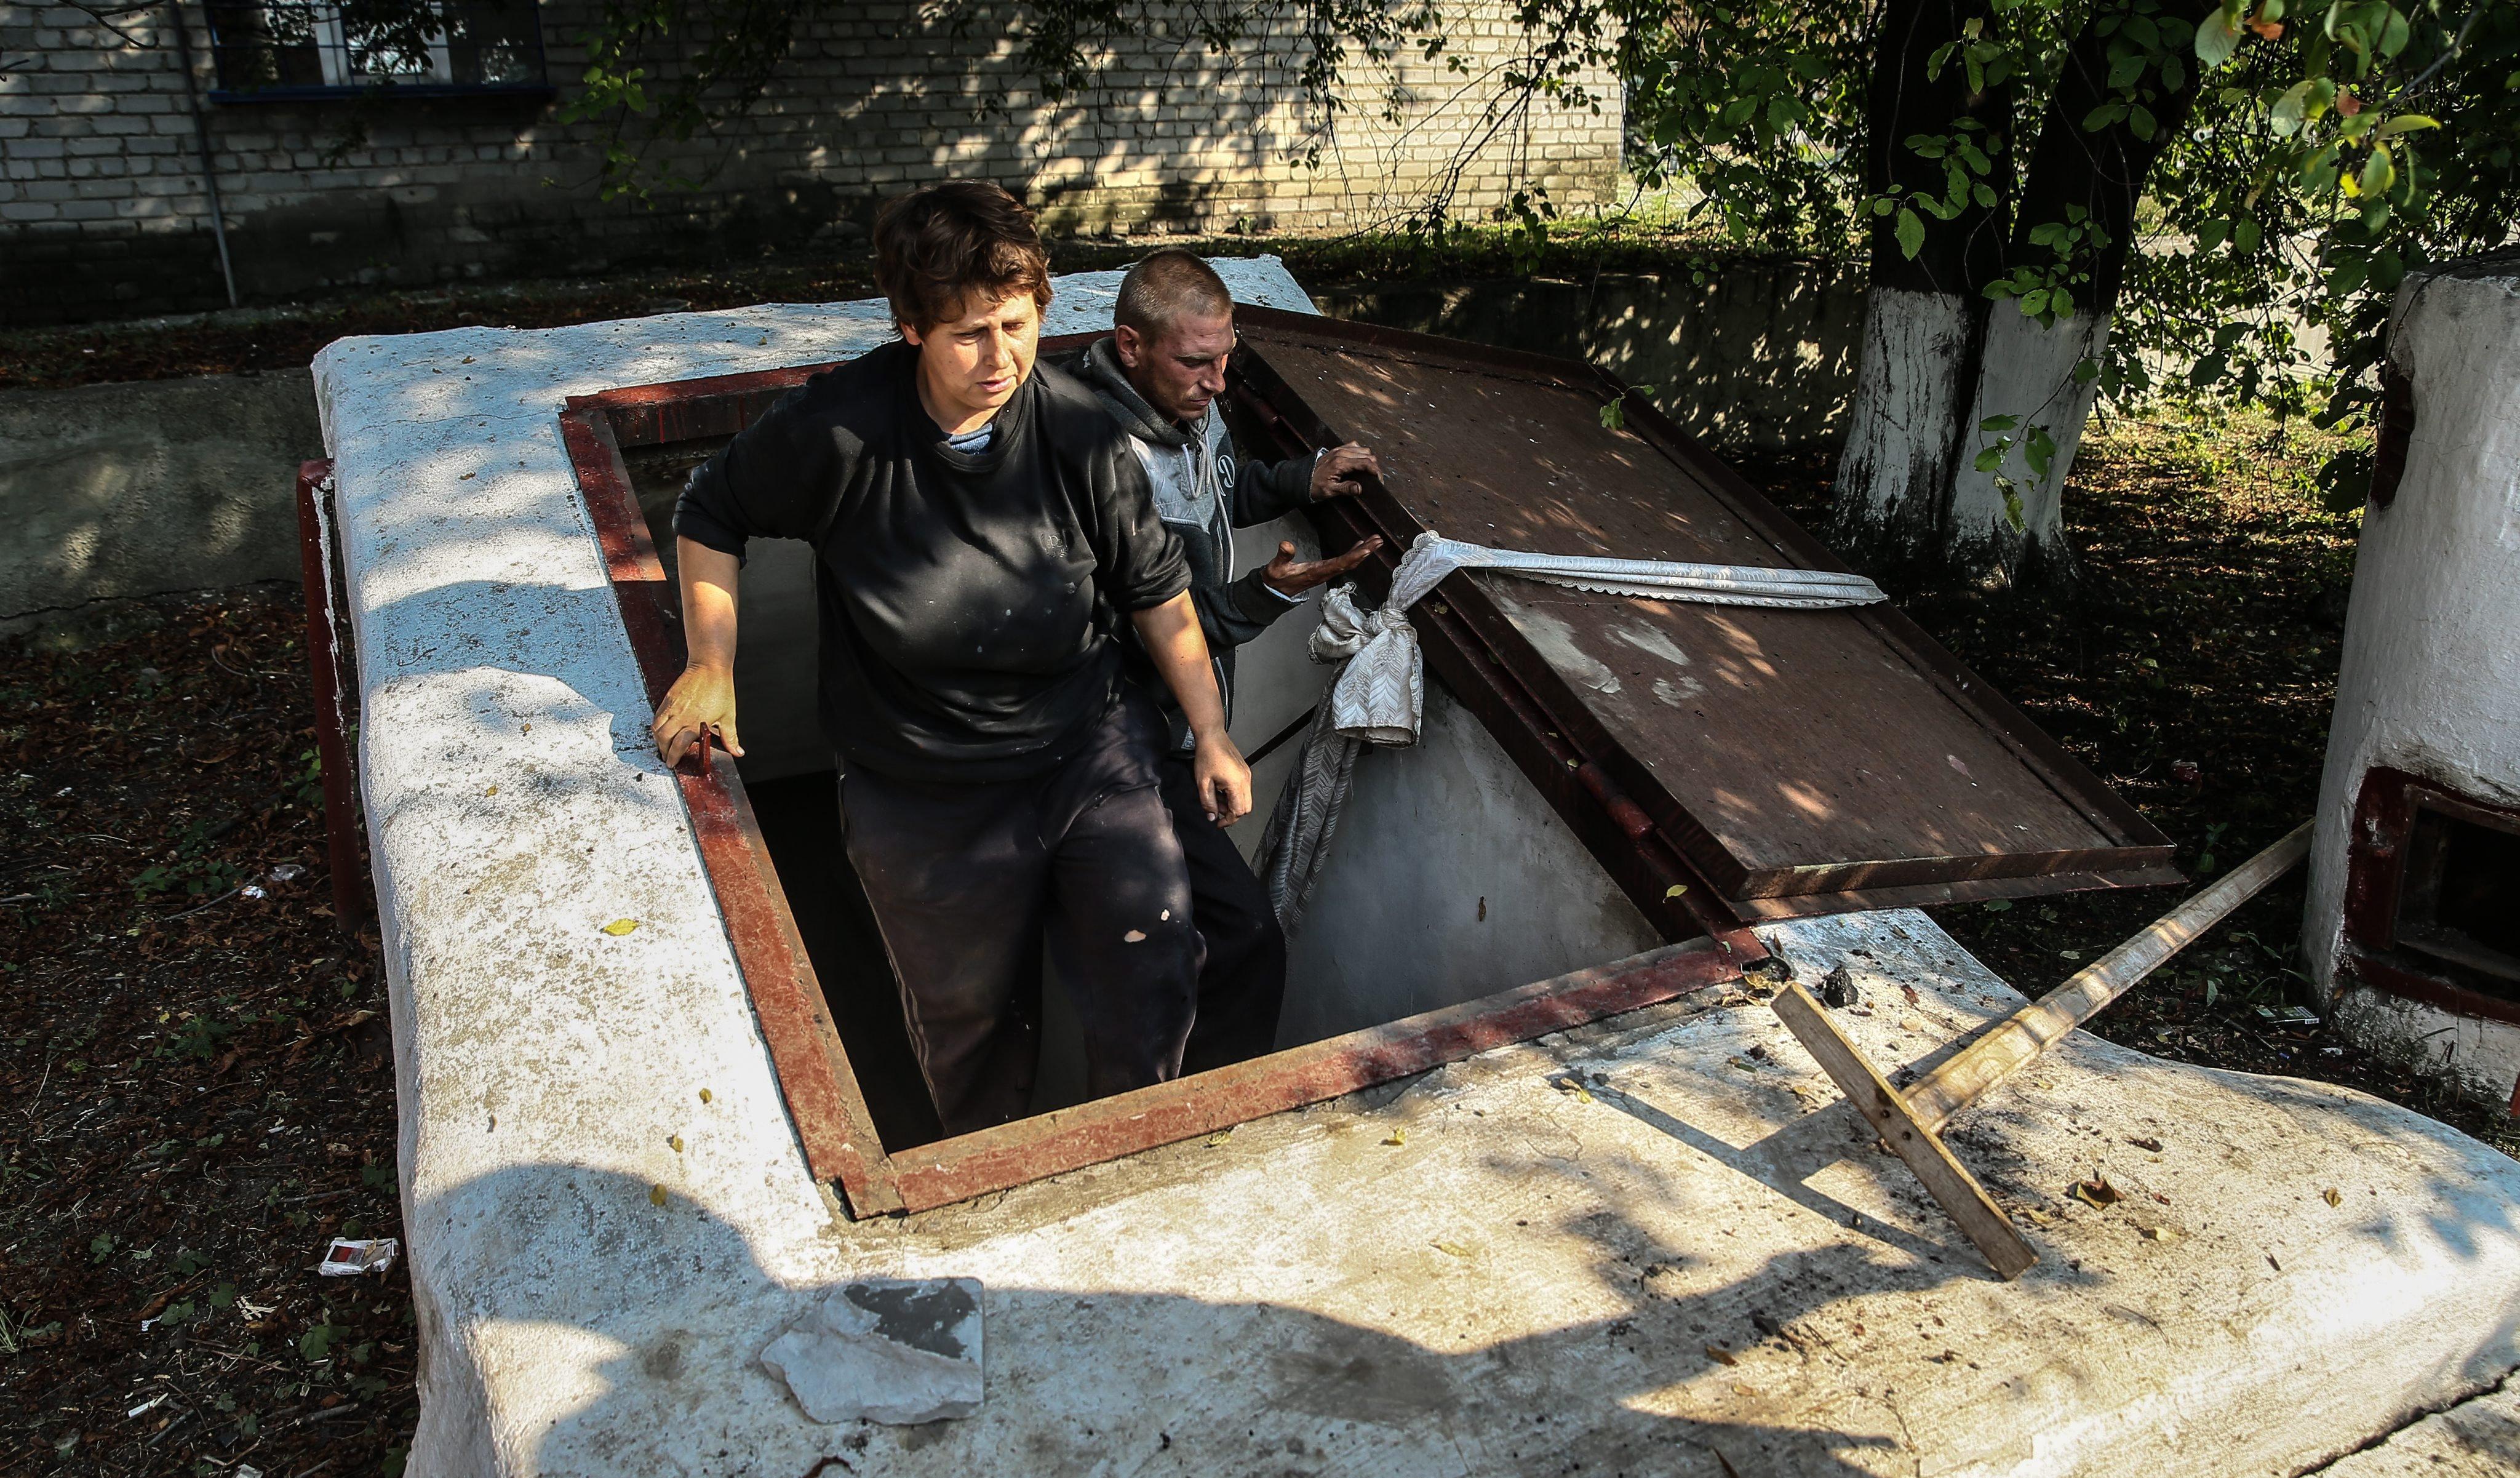 Vera and Vladimir leave a shelter in Ilovaysk, some 50km from Donetsk, eastern Ukraine on August 14, 2014.